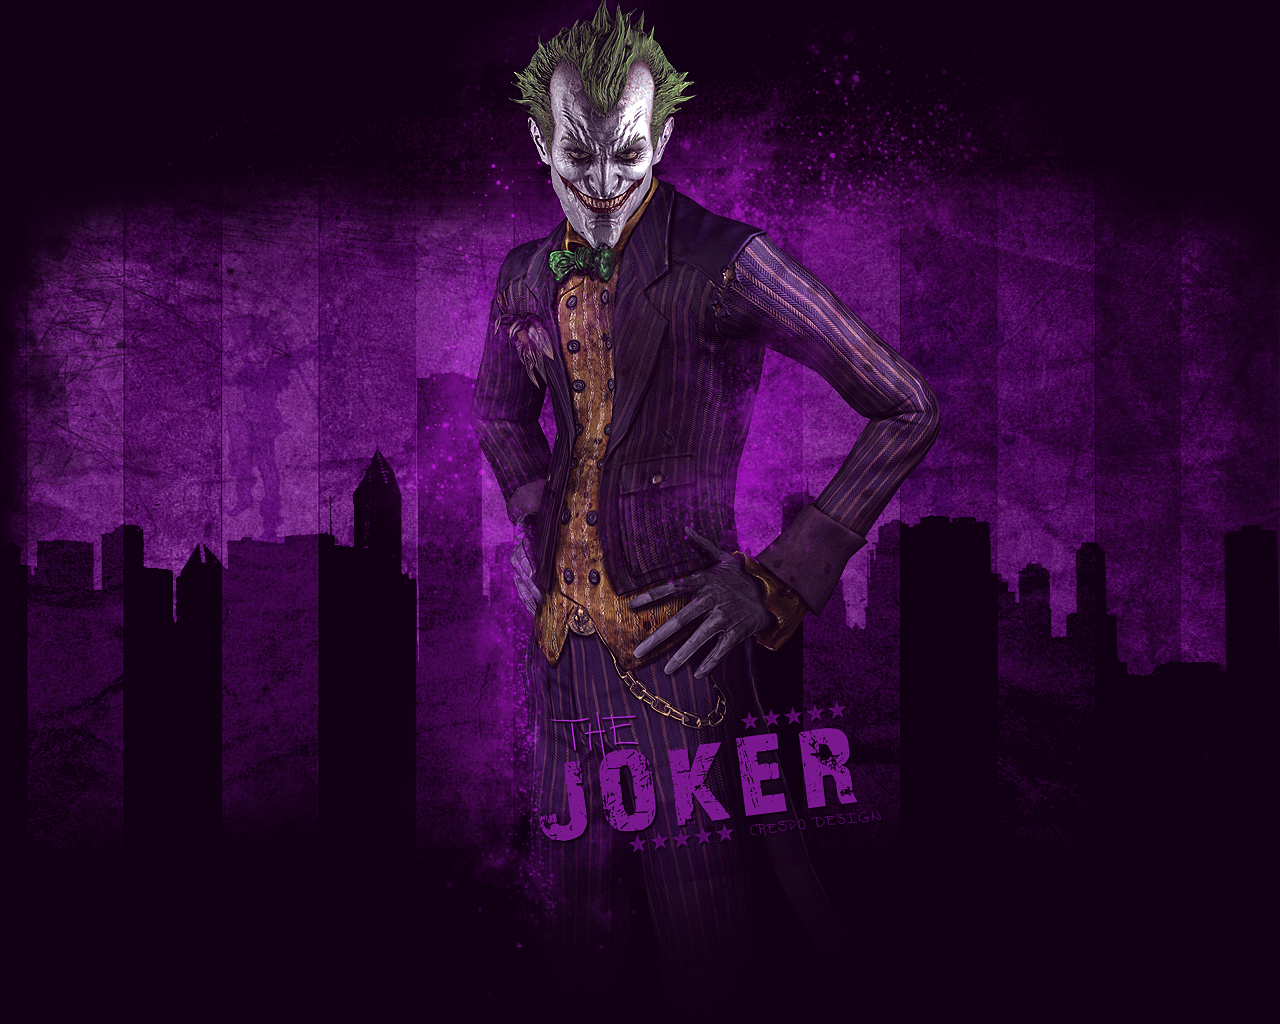 Joker Wallpaper by Cre5po on DeviantArt